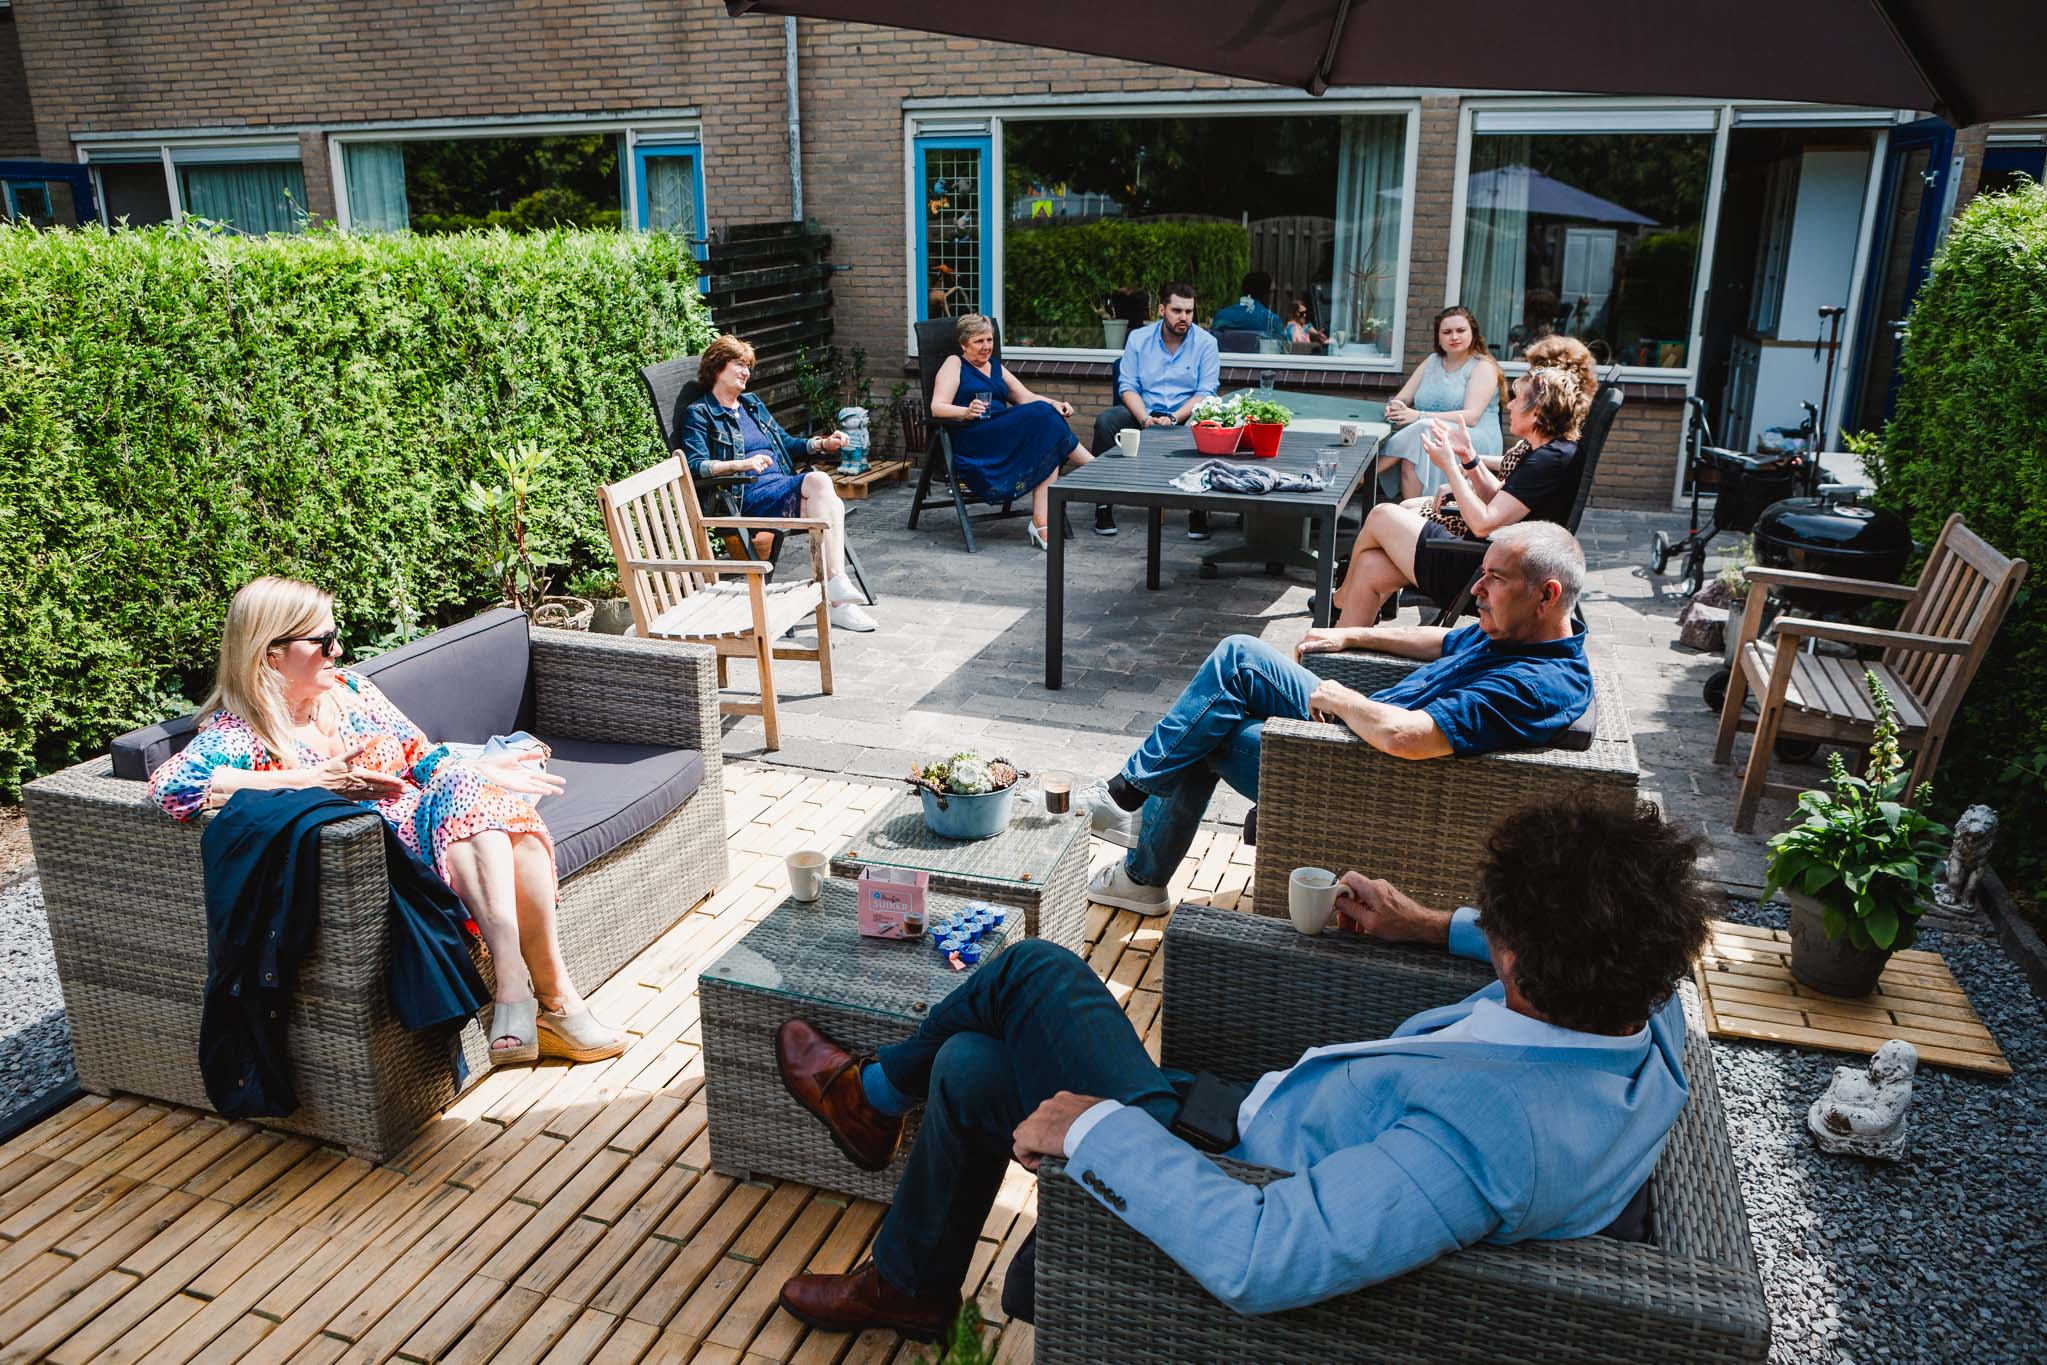 Bruiloft Reportage Geregistreerd Partnerschap Flevoland Lelystad Shot By Sylla 2